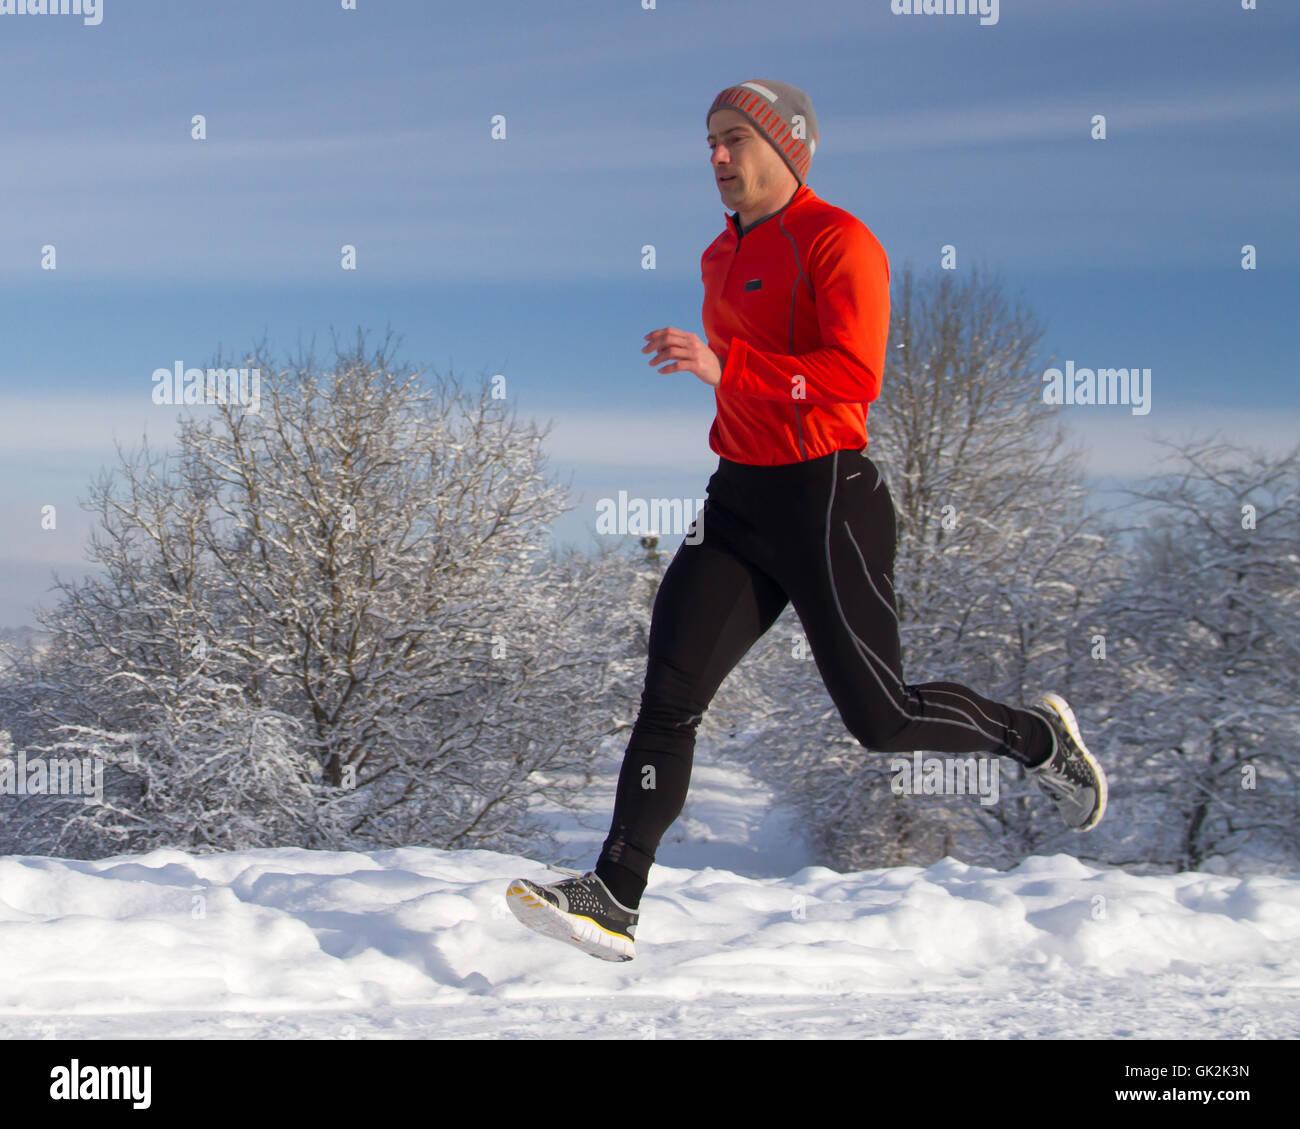 winter active sport - Stock Image